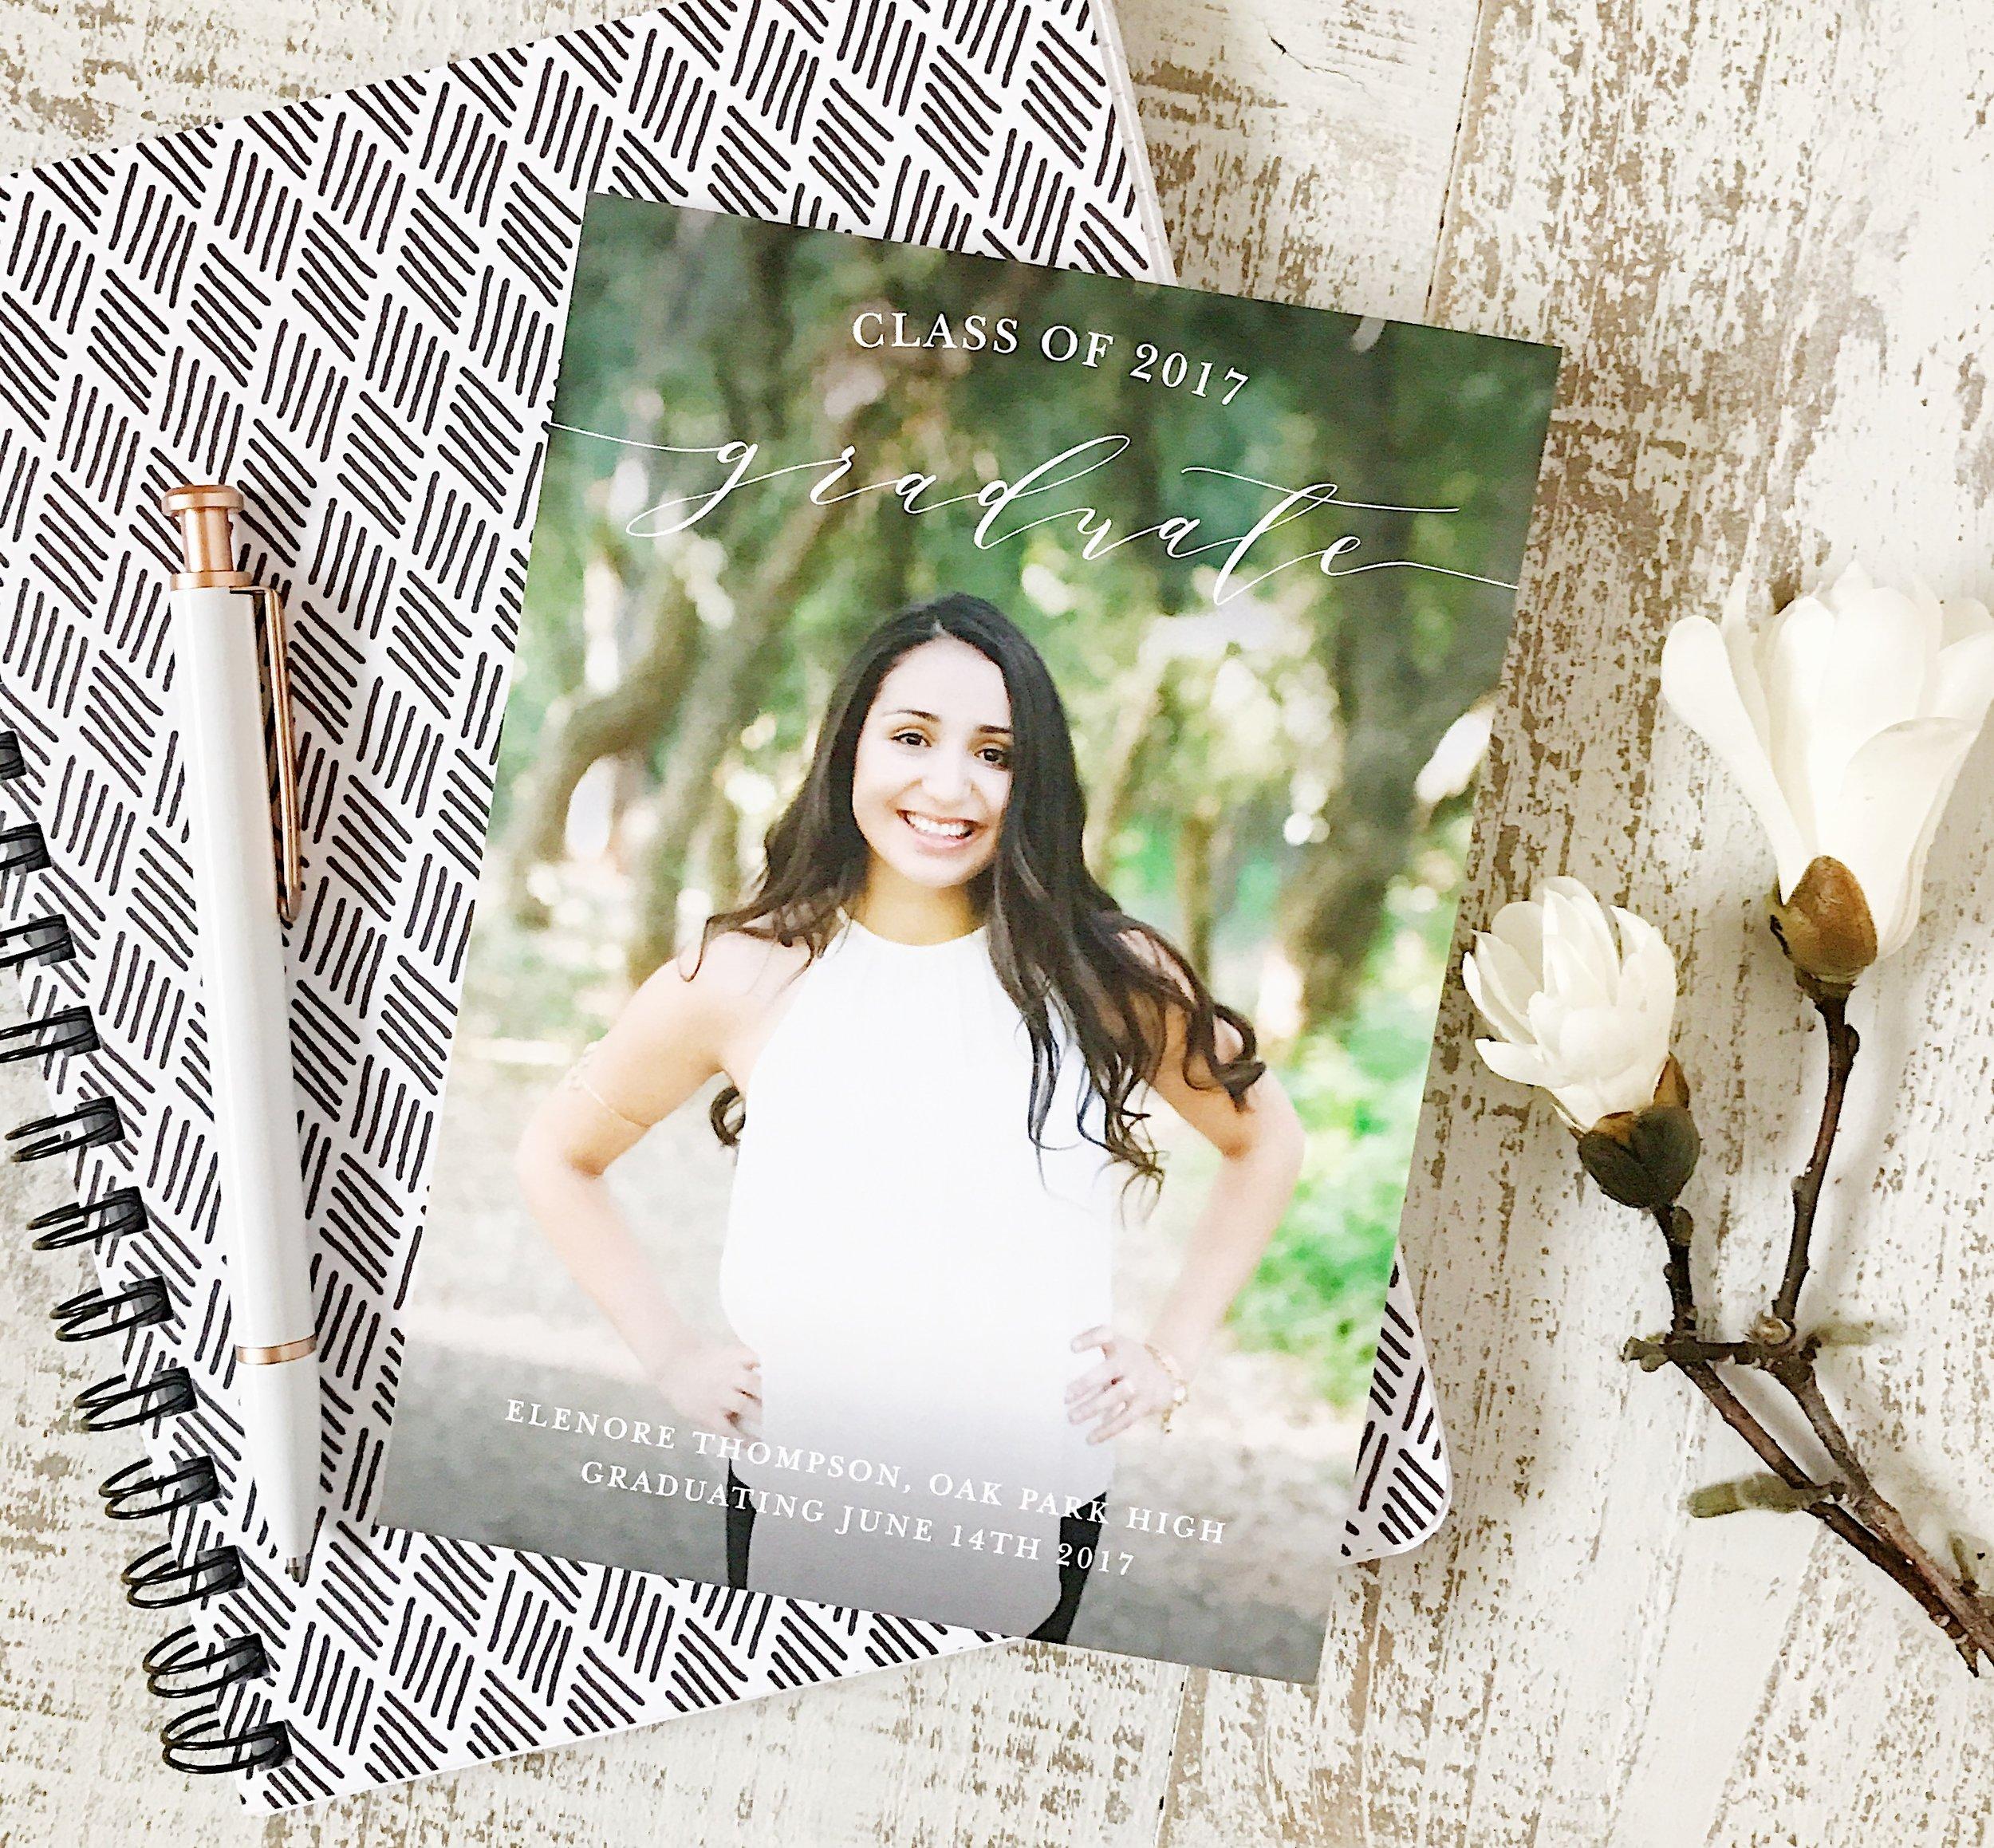 Basic Invite, Sponsored Post, Ad, Vanessa Jordan Seniors, Senior Photographer, Graduation Session